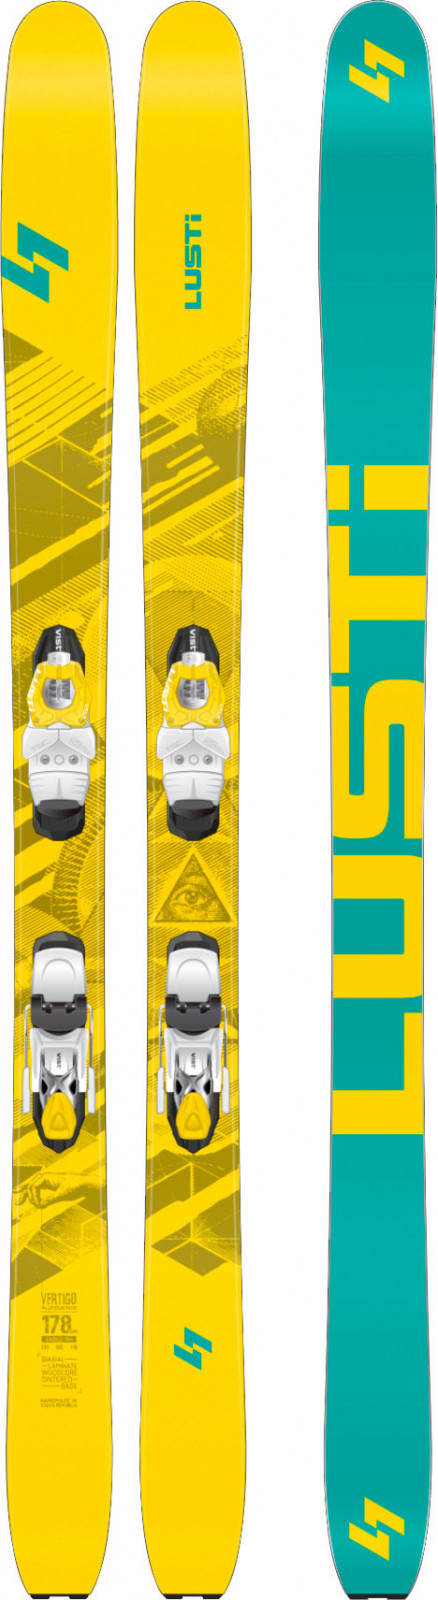 Lusti Vertigo + VIST VSP 412 + deska SPEEDSPACER